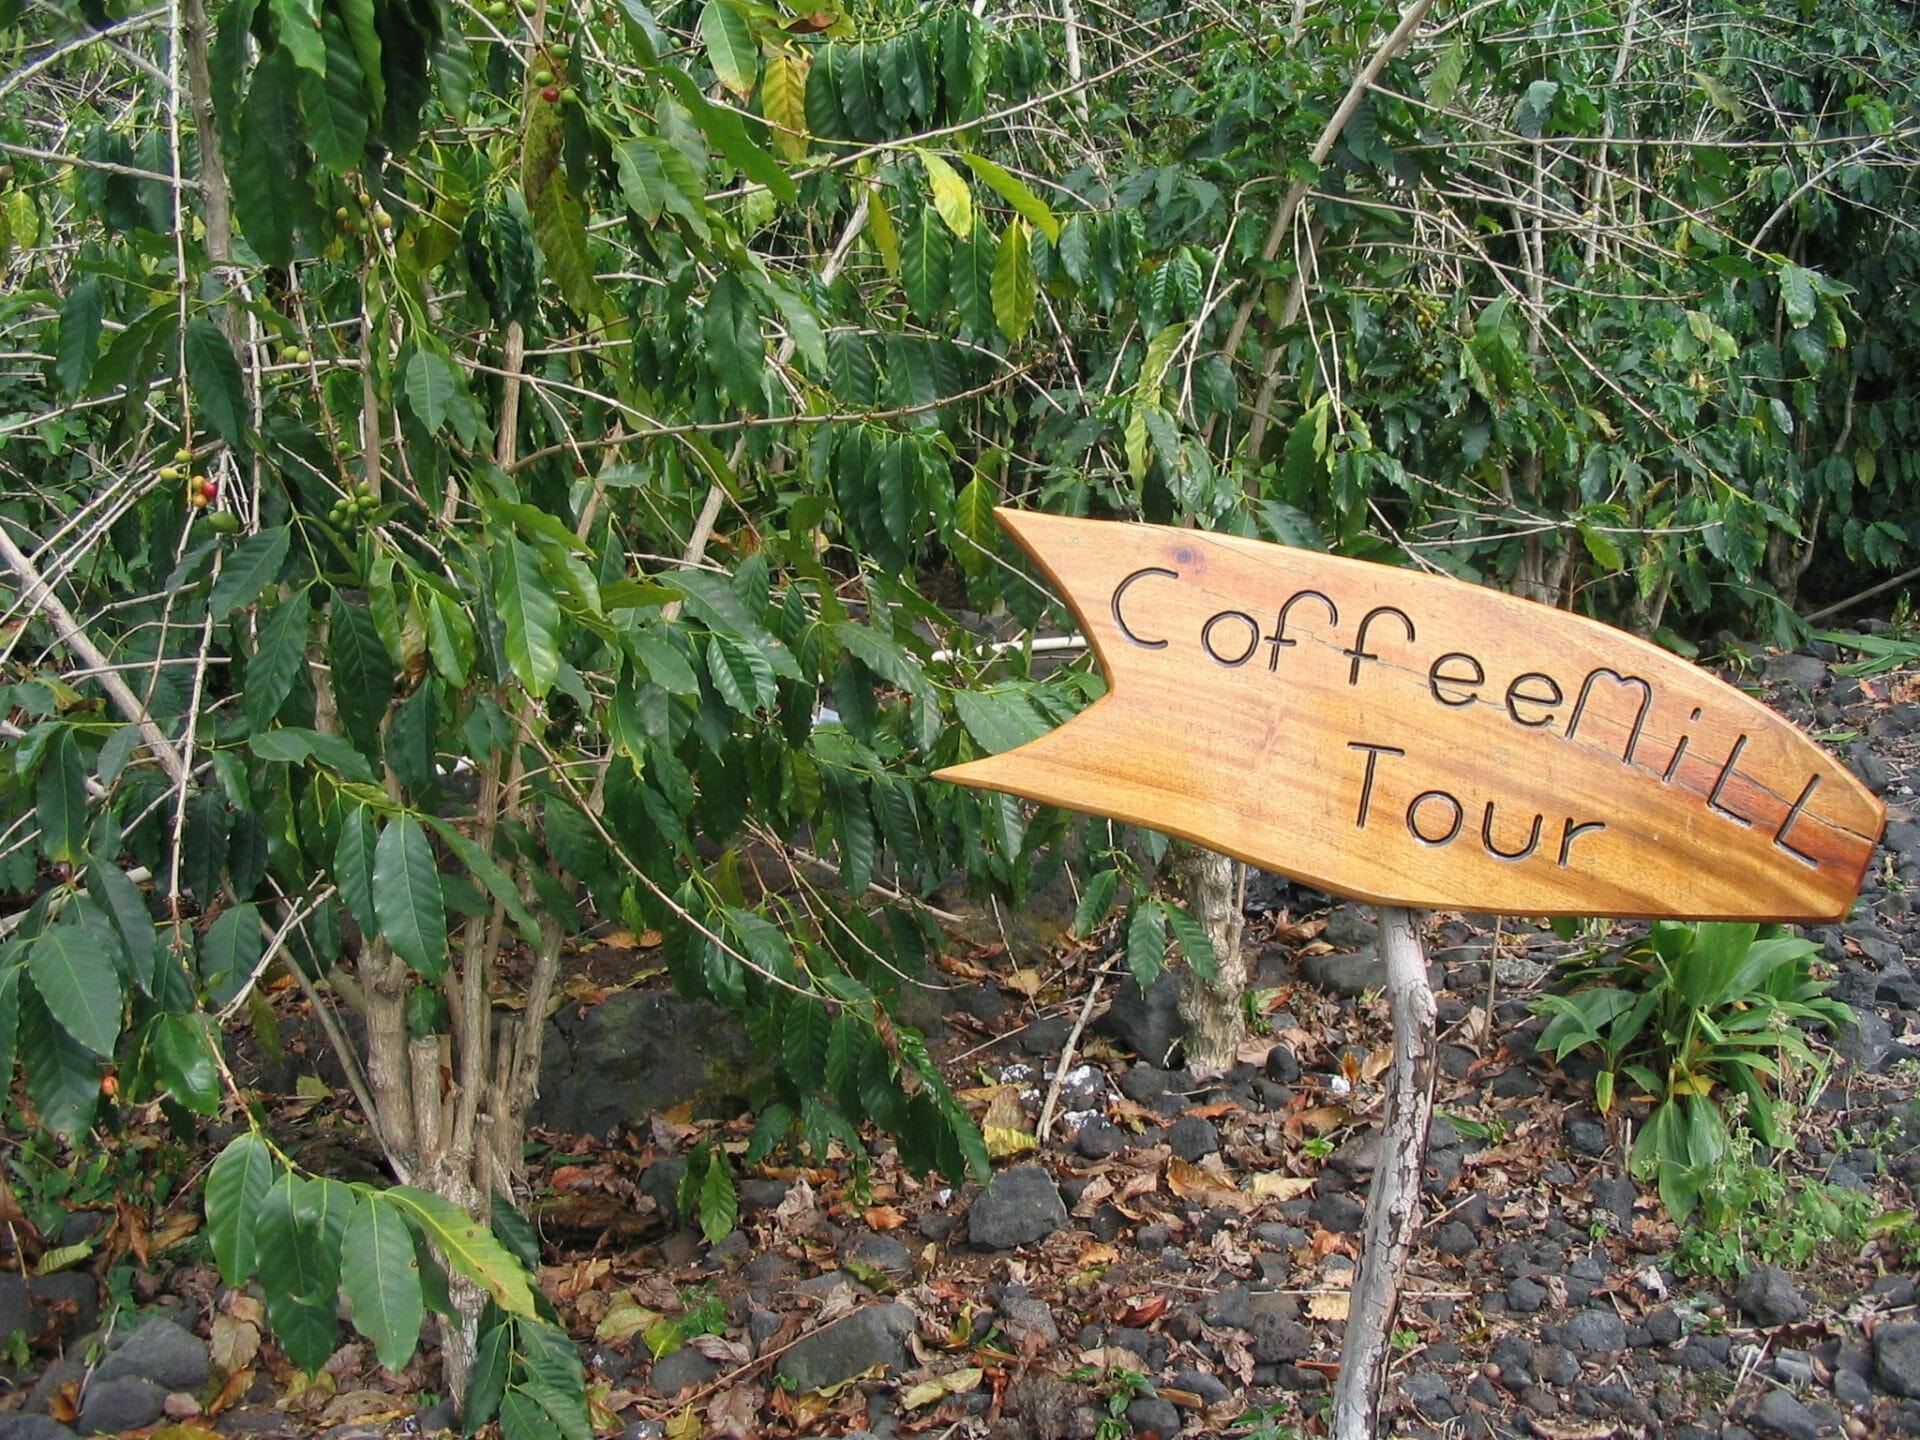 Ah, Big Island coffee! Yum...and a tour...